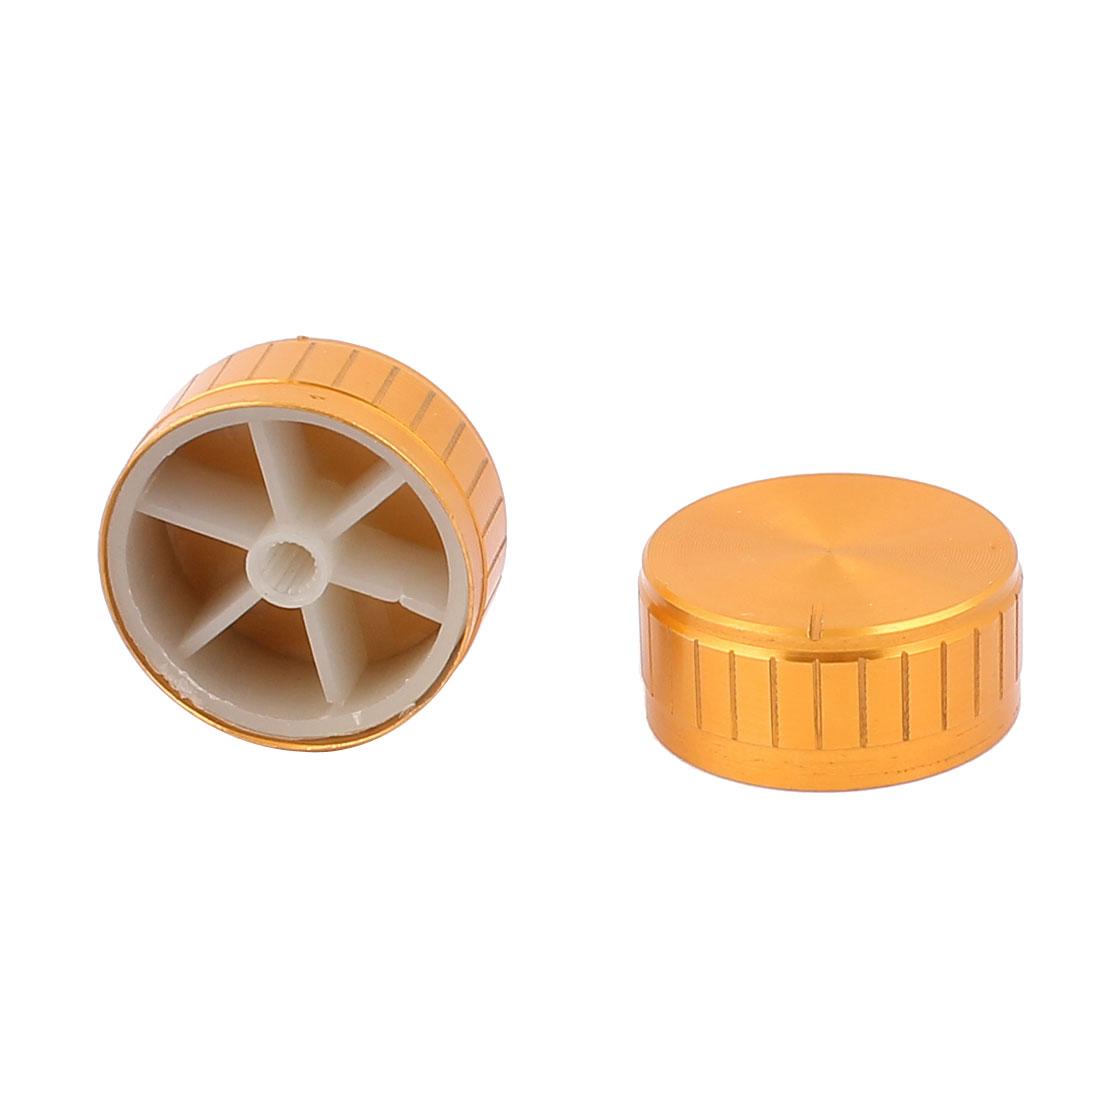 2 Pcs 40mm x 6mm Aluminium Alloy Potentiometer Control Knob Volume Cap Knurled Button Gold Tone